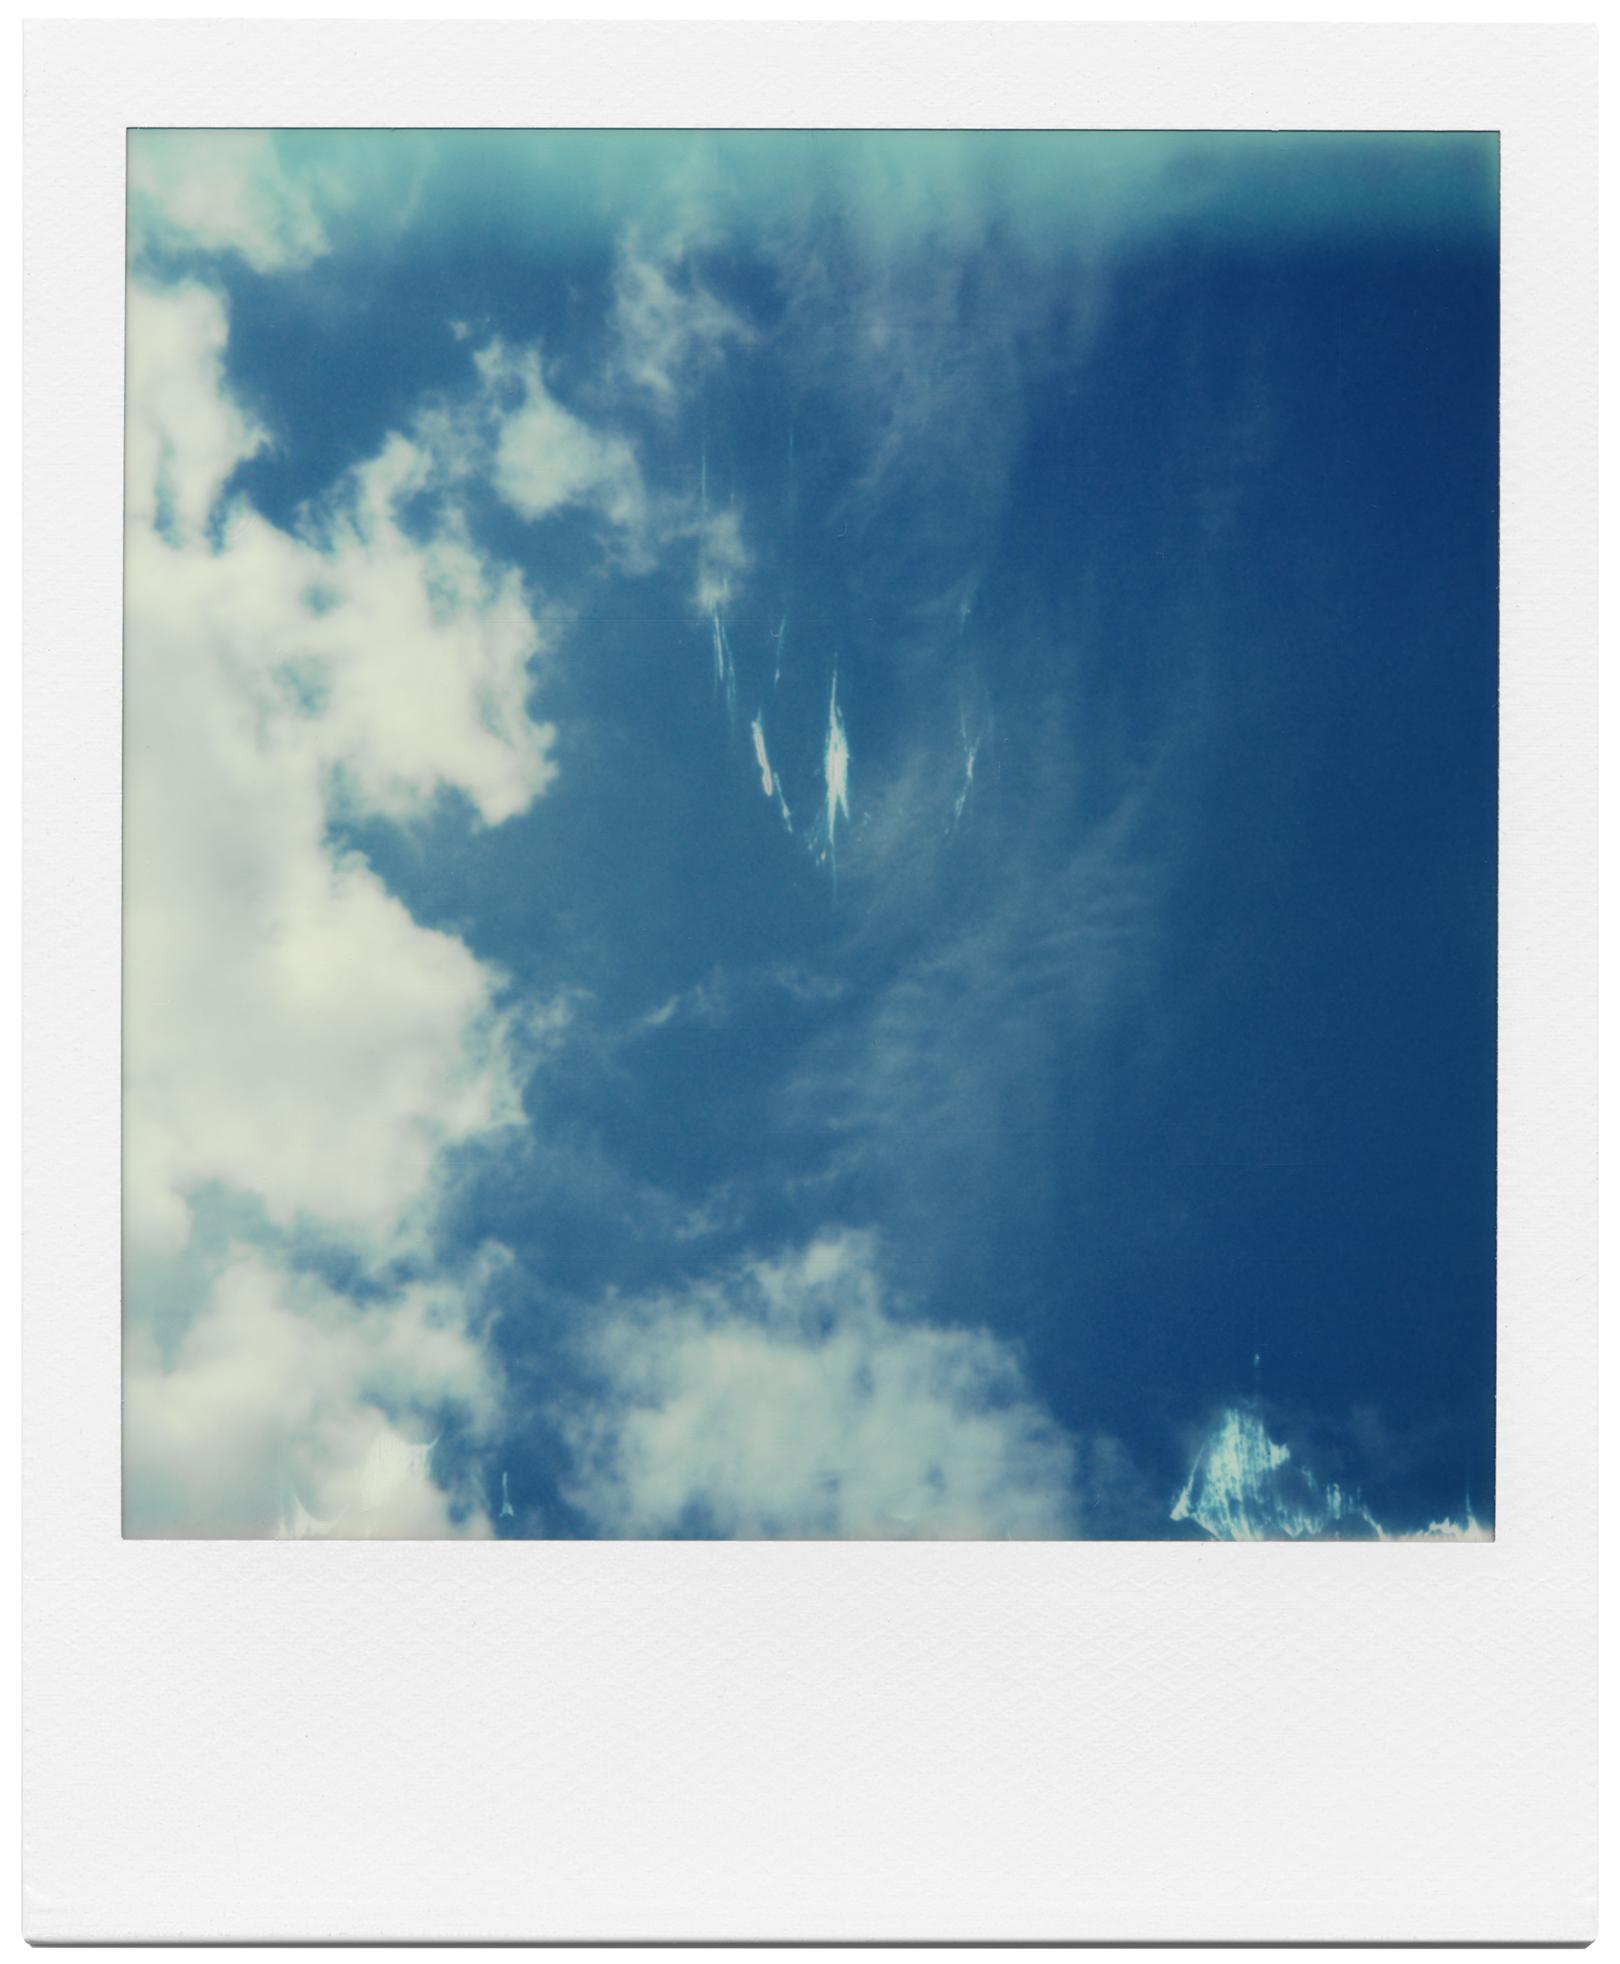 2017_June_Sky_Polaroid001_WEB.jpg